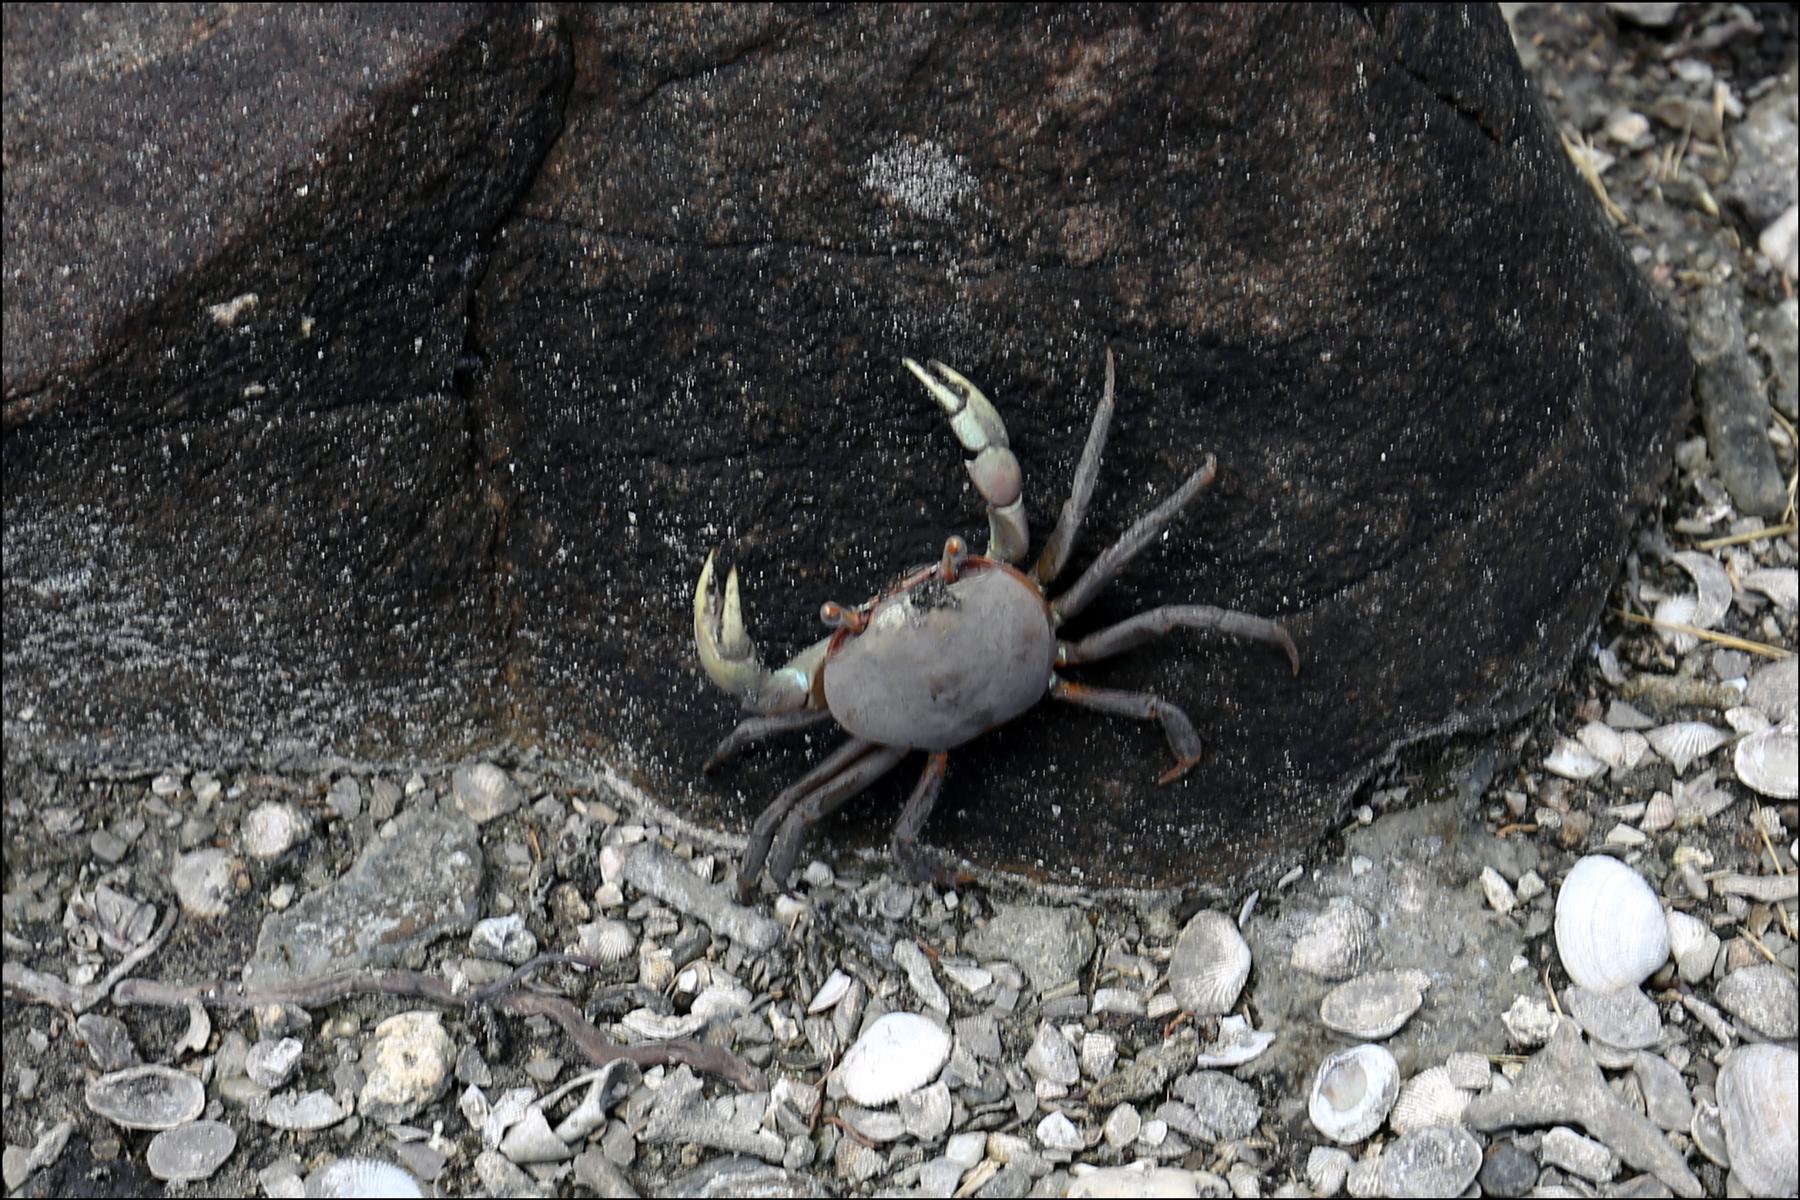 Land Crab (Cardisoma carnifex)